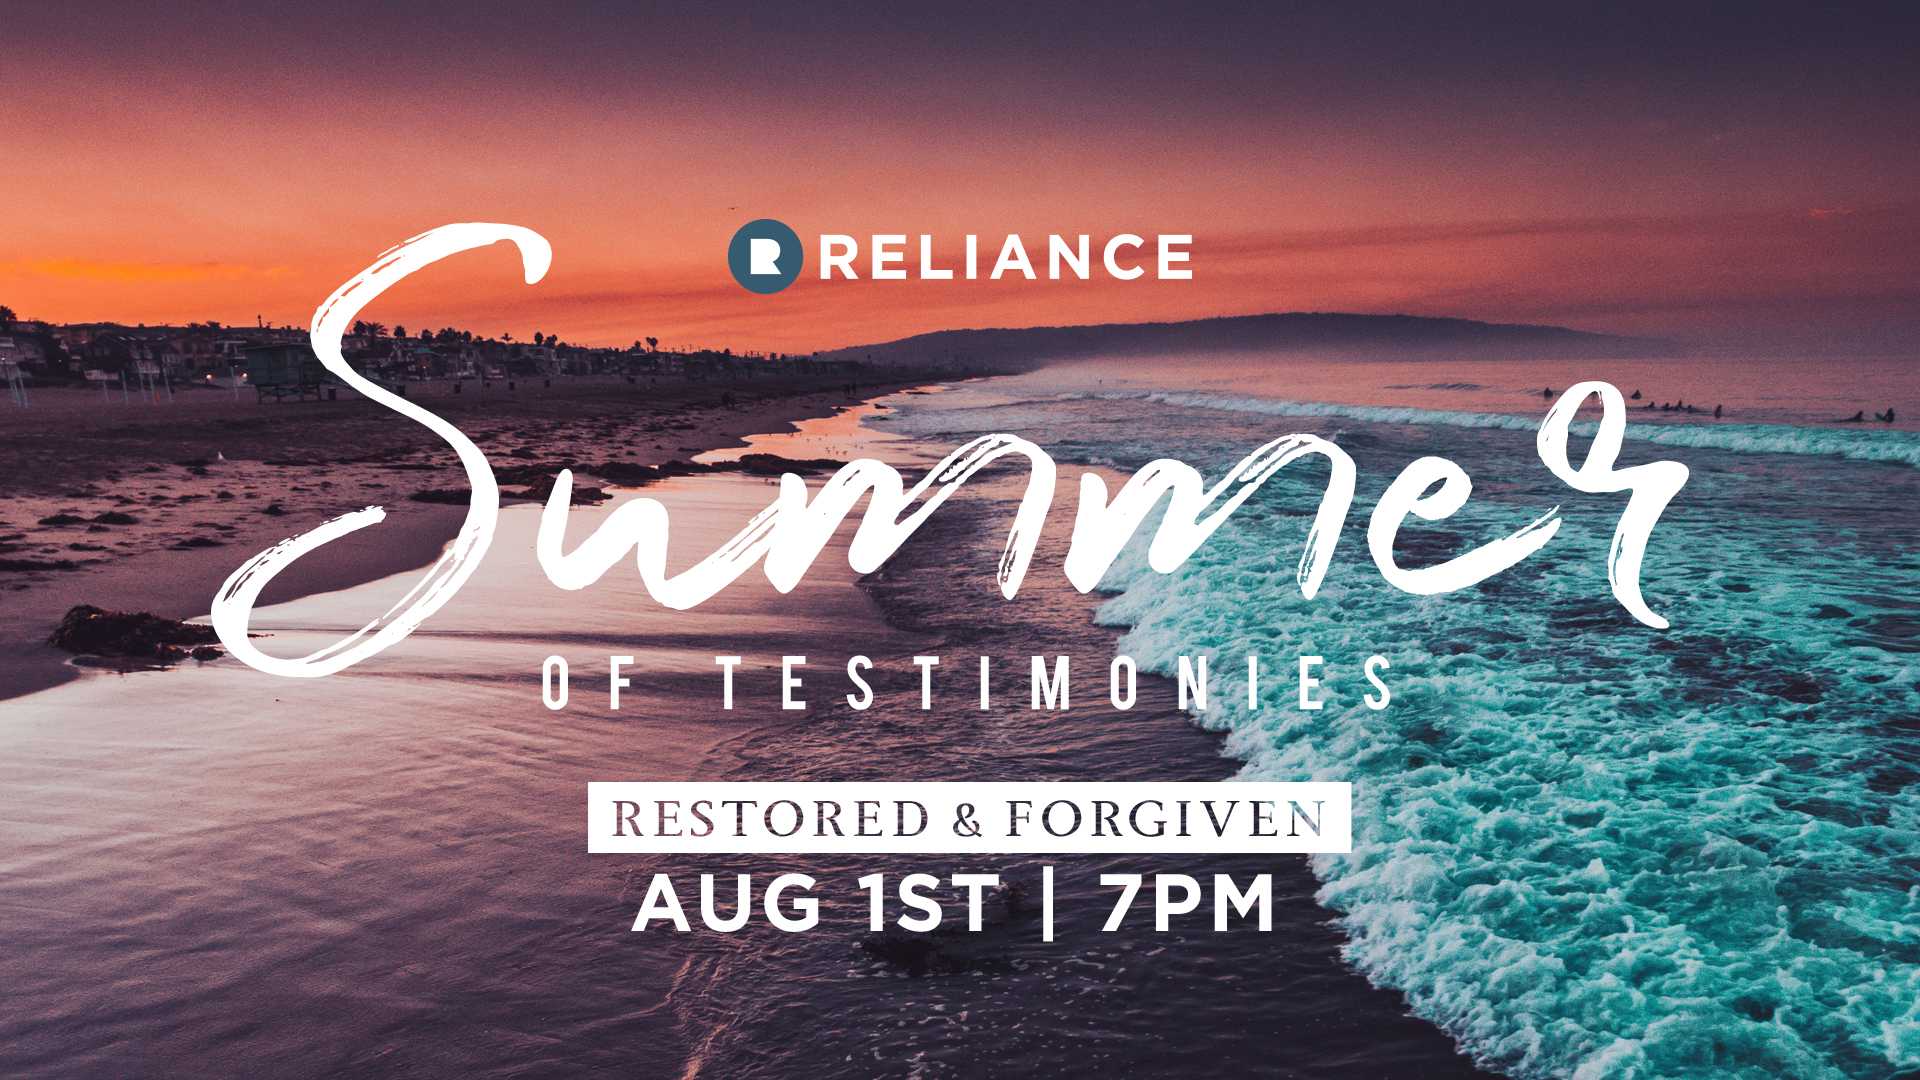 Summer-Of-Testimonies-Ad-Slide (2)